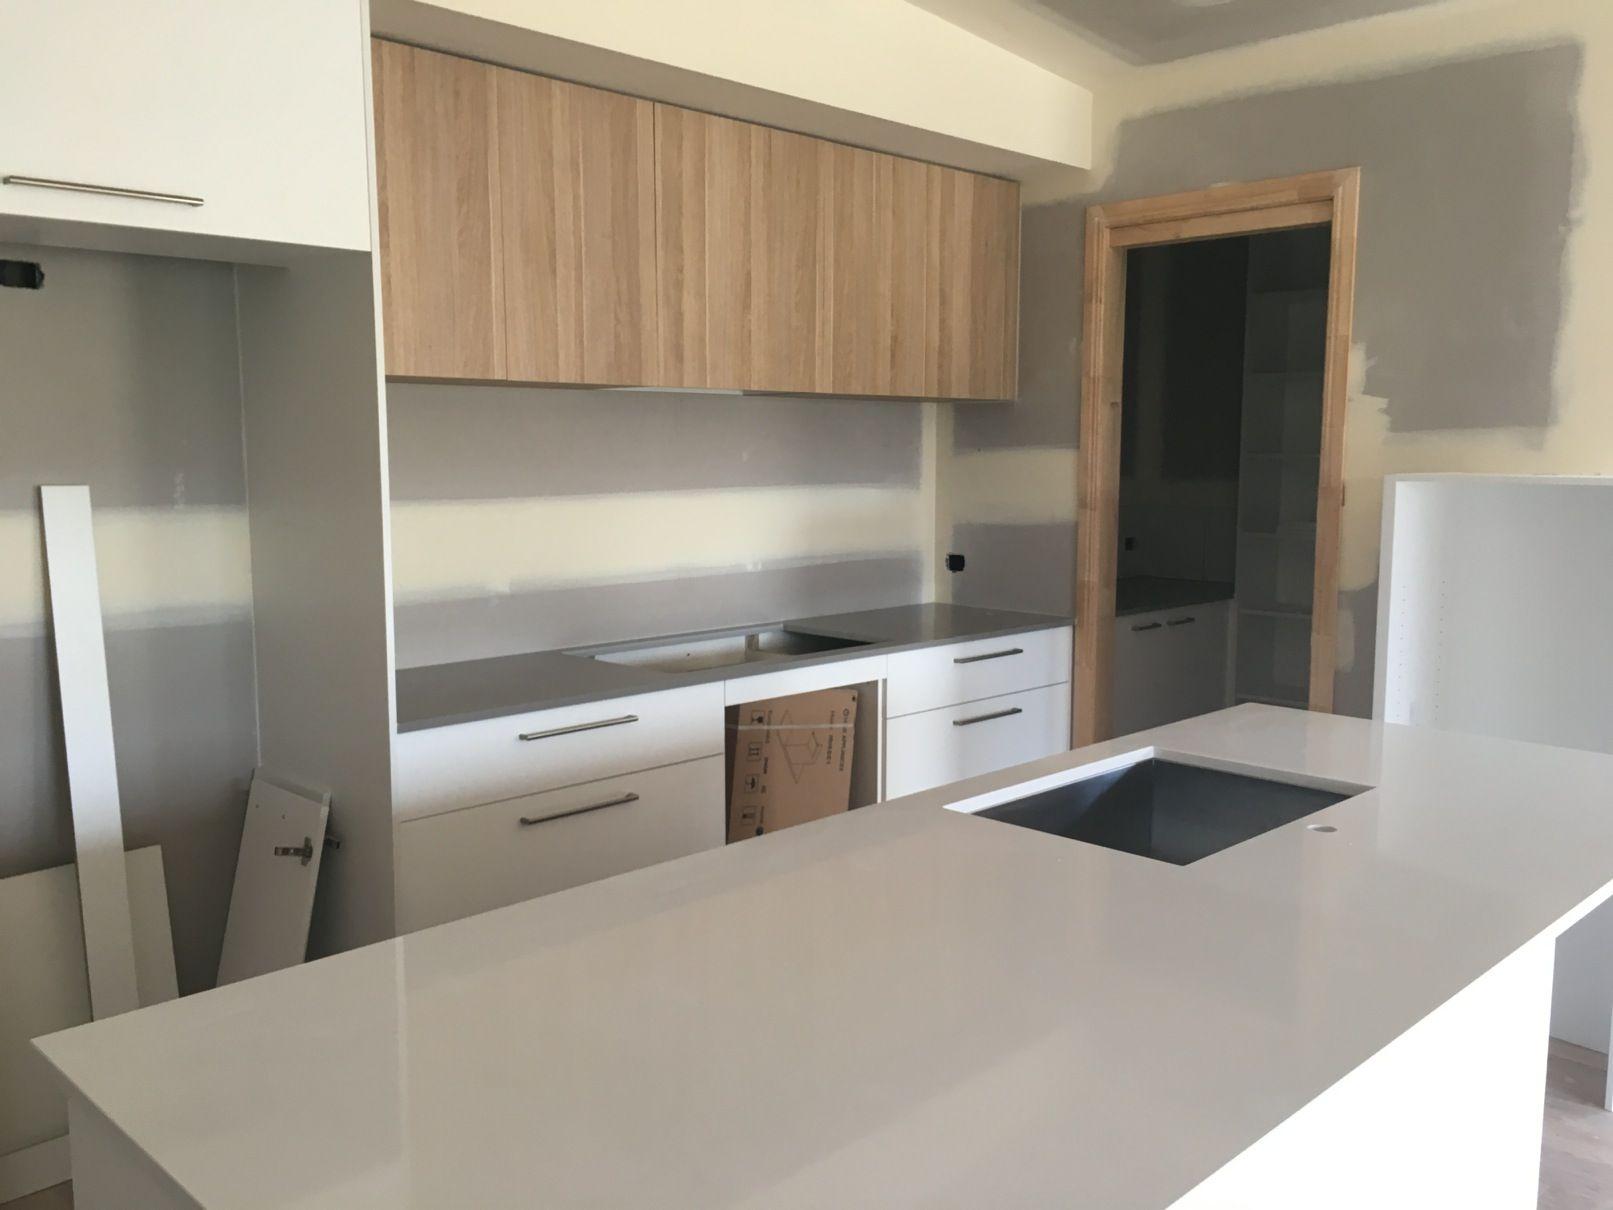 Polytec natural oak revine cabinets with white + concrete look stone